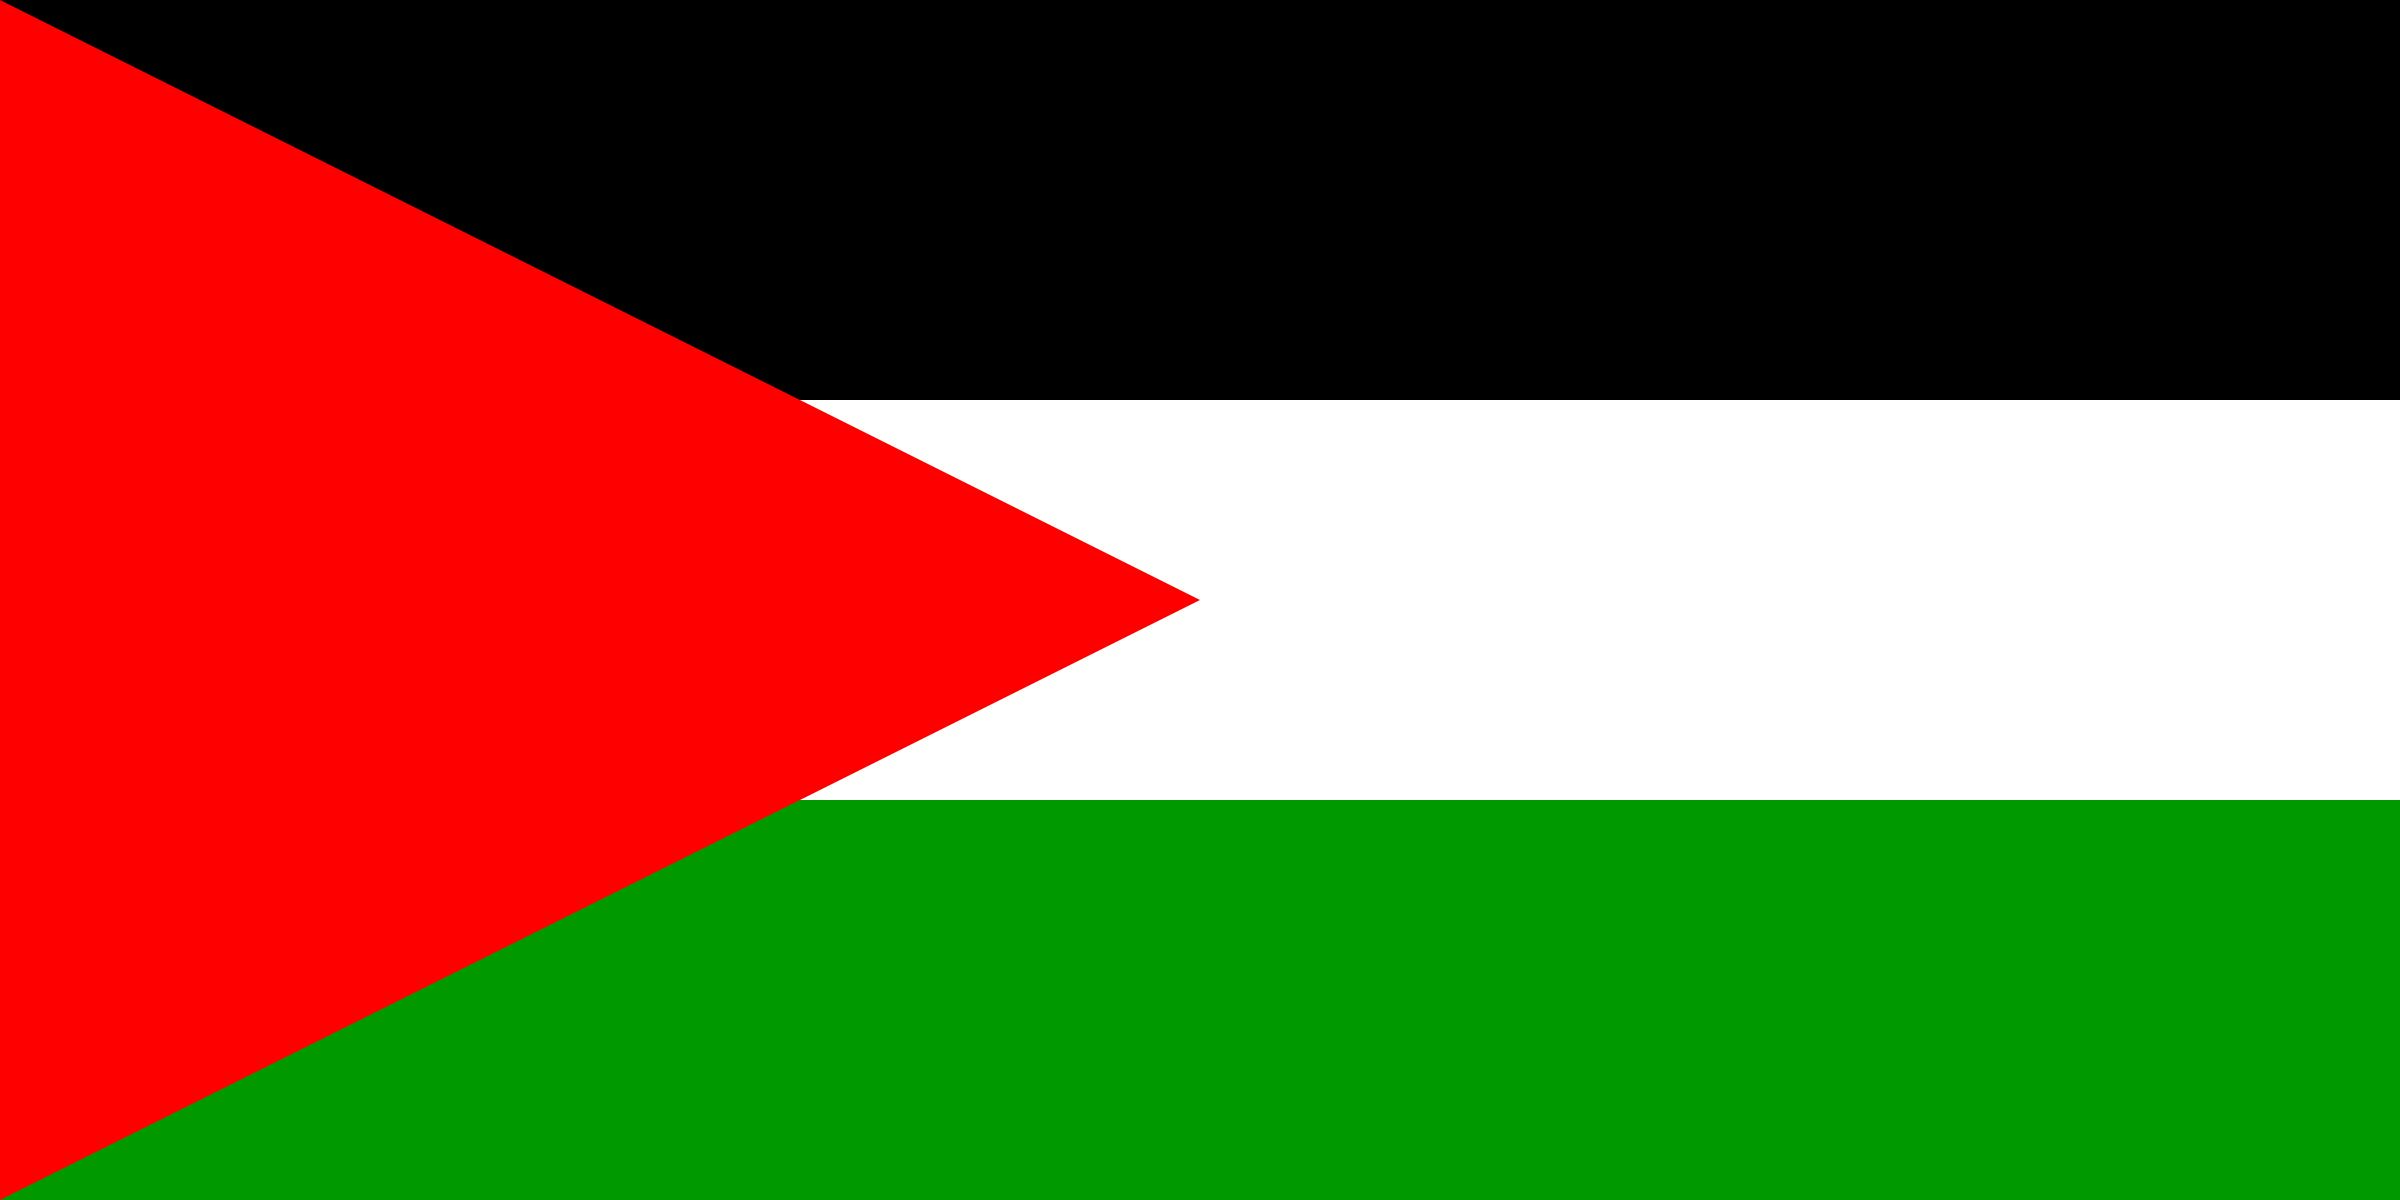 clipart israel flag - photo #30